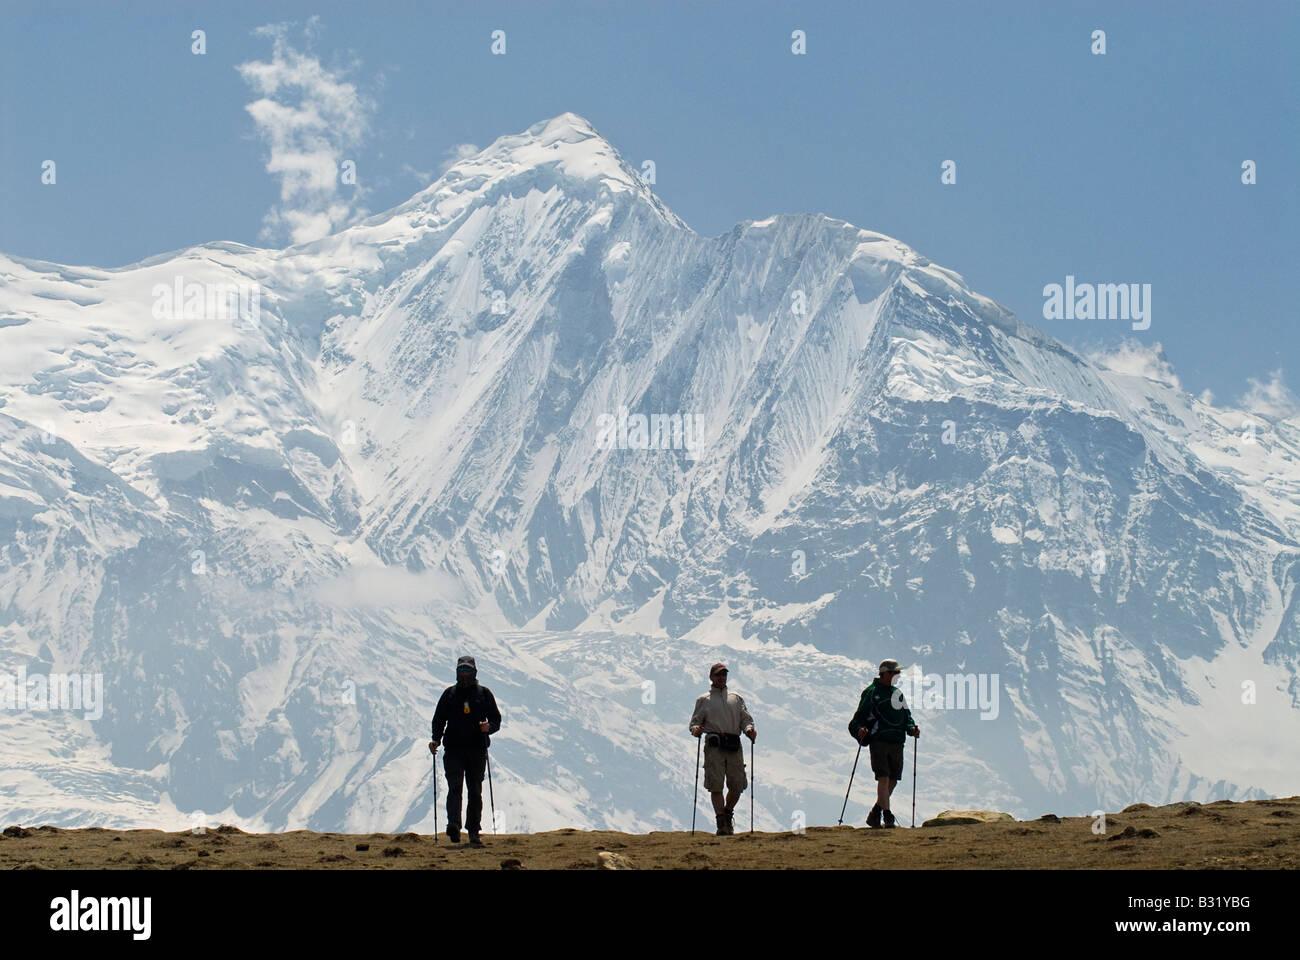 Trekkers walking in the Annapurna mountains, Himalayas, Nepal - Stock Image